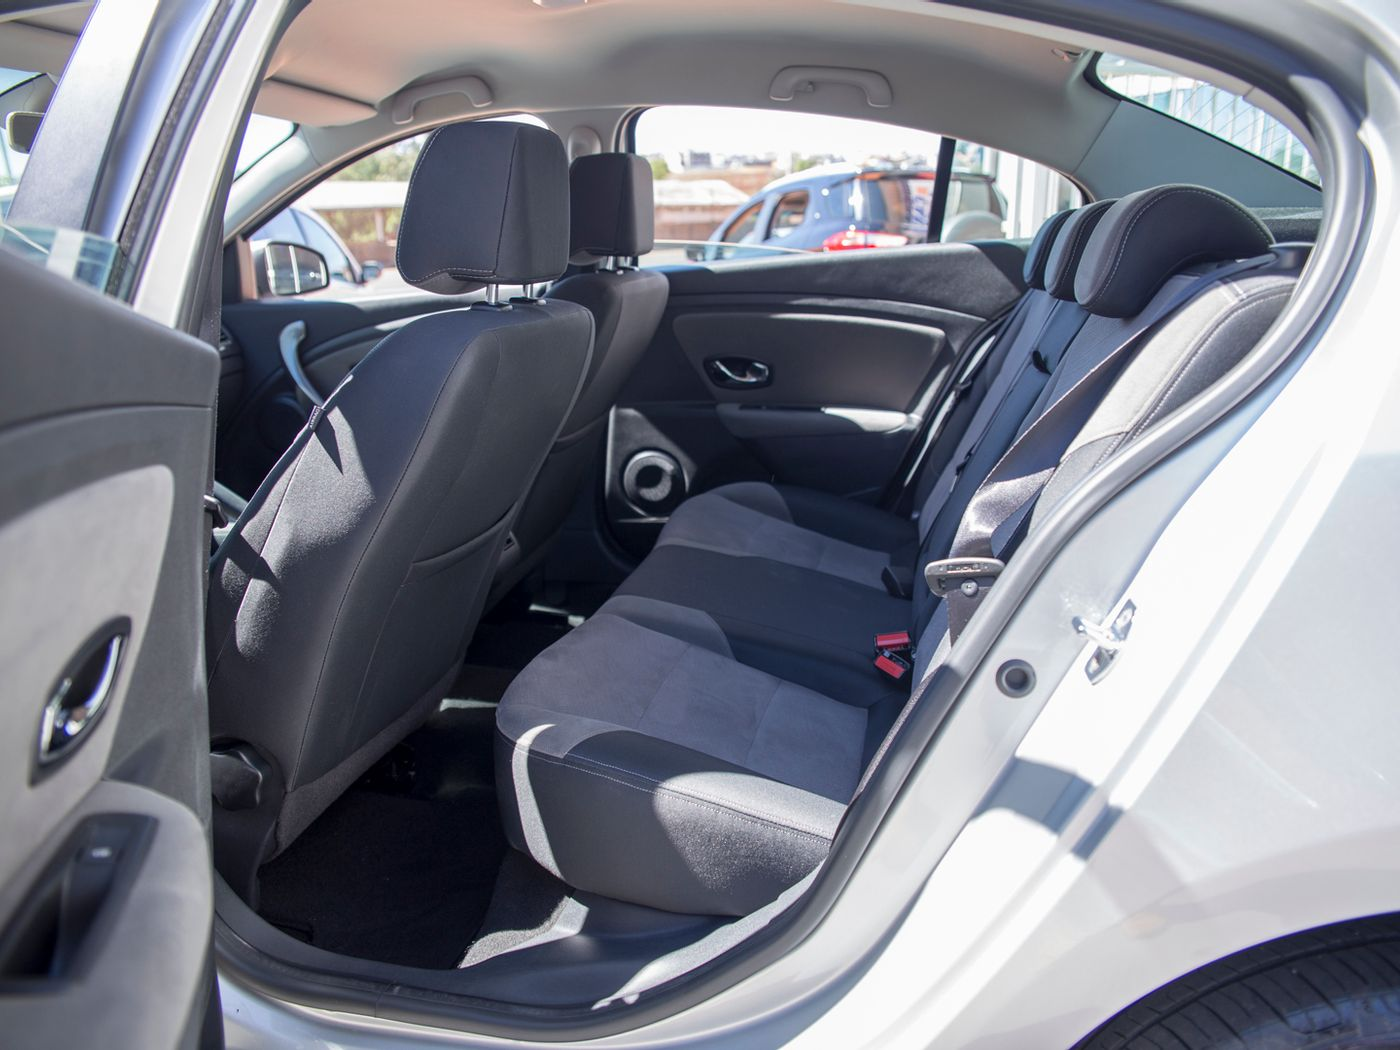 Renault FLUENCE Sed. Dyn. Plus 2.0 16V FLEX Aut.